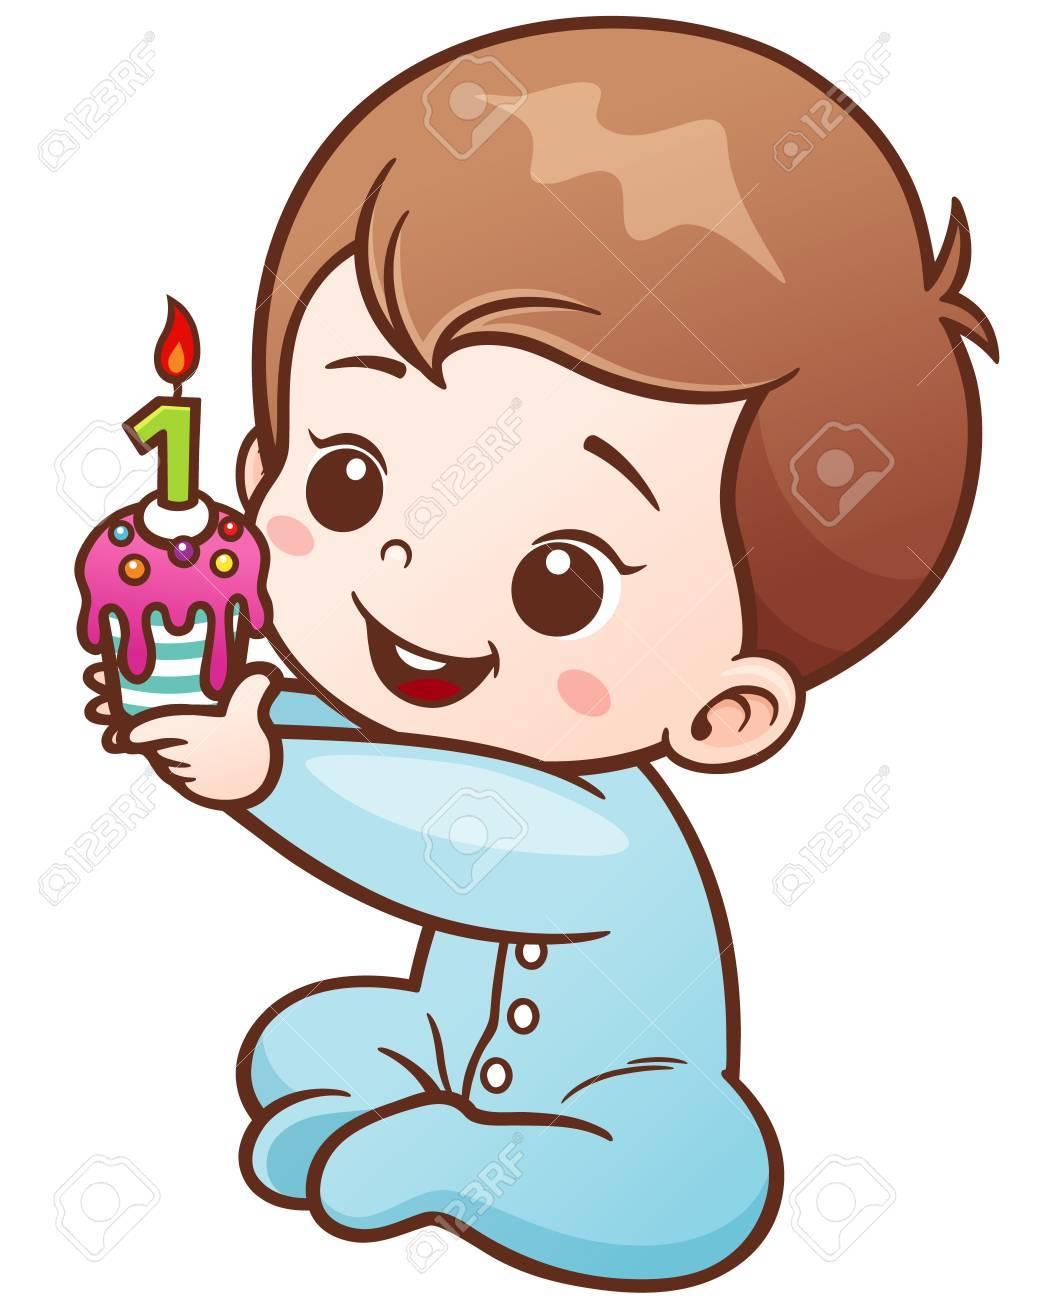 Vector Illustration Of Cartoon Cute Baby Holding Birthday Cake